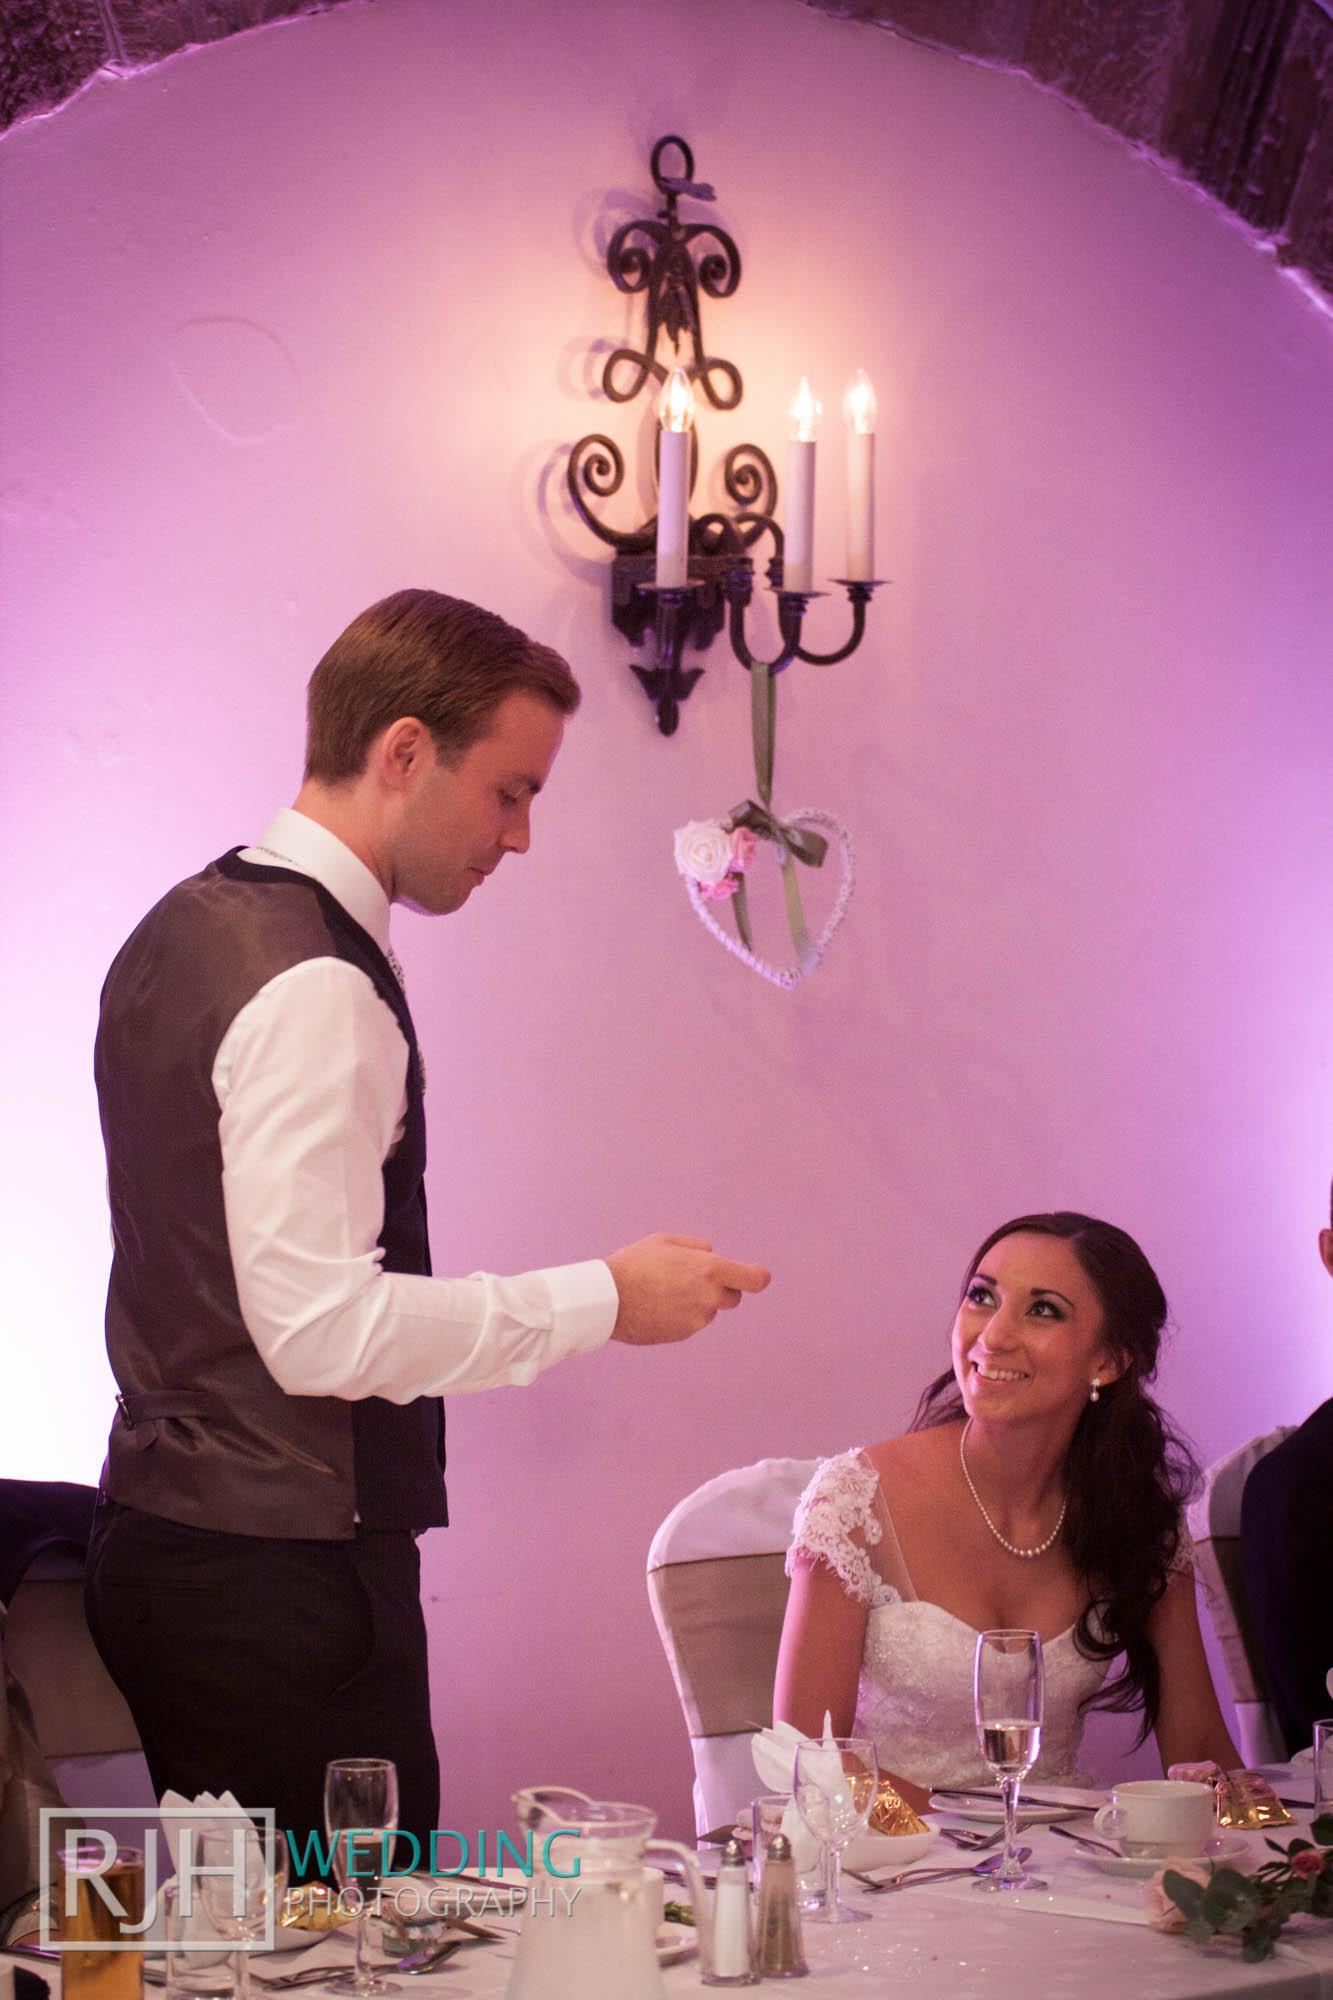 RJH Wedding Photography_Tankersley Manor Wedding_48.jpg